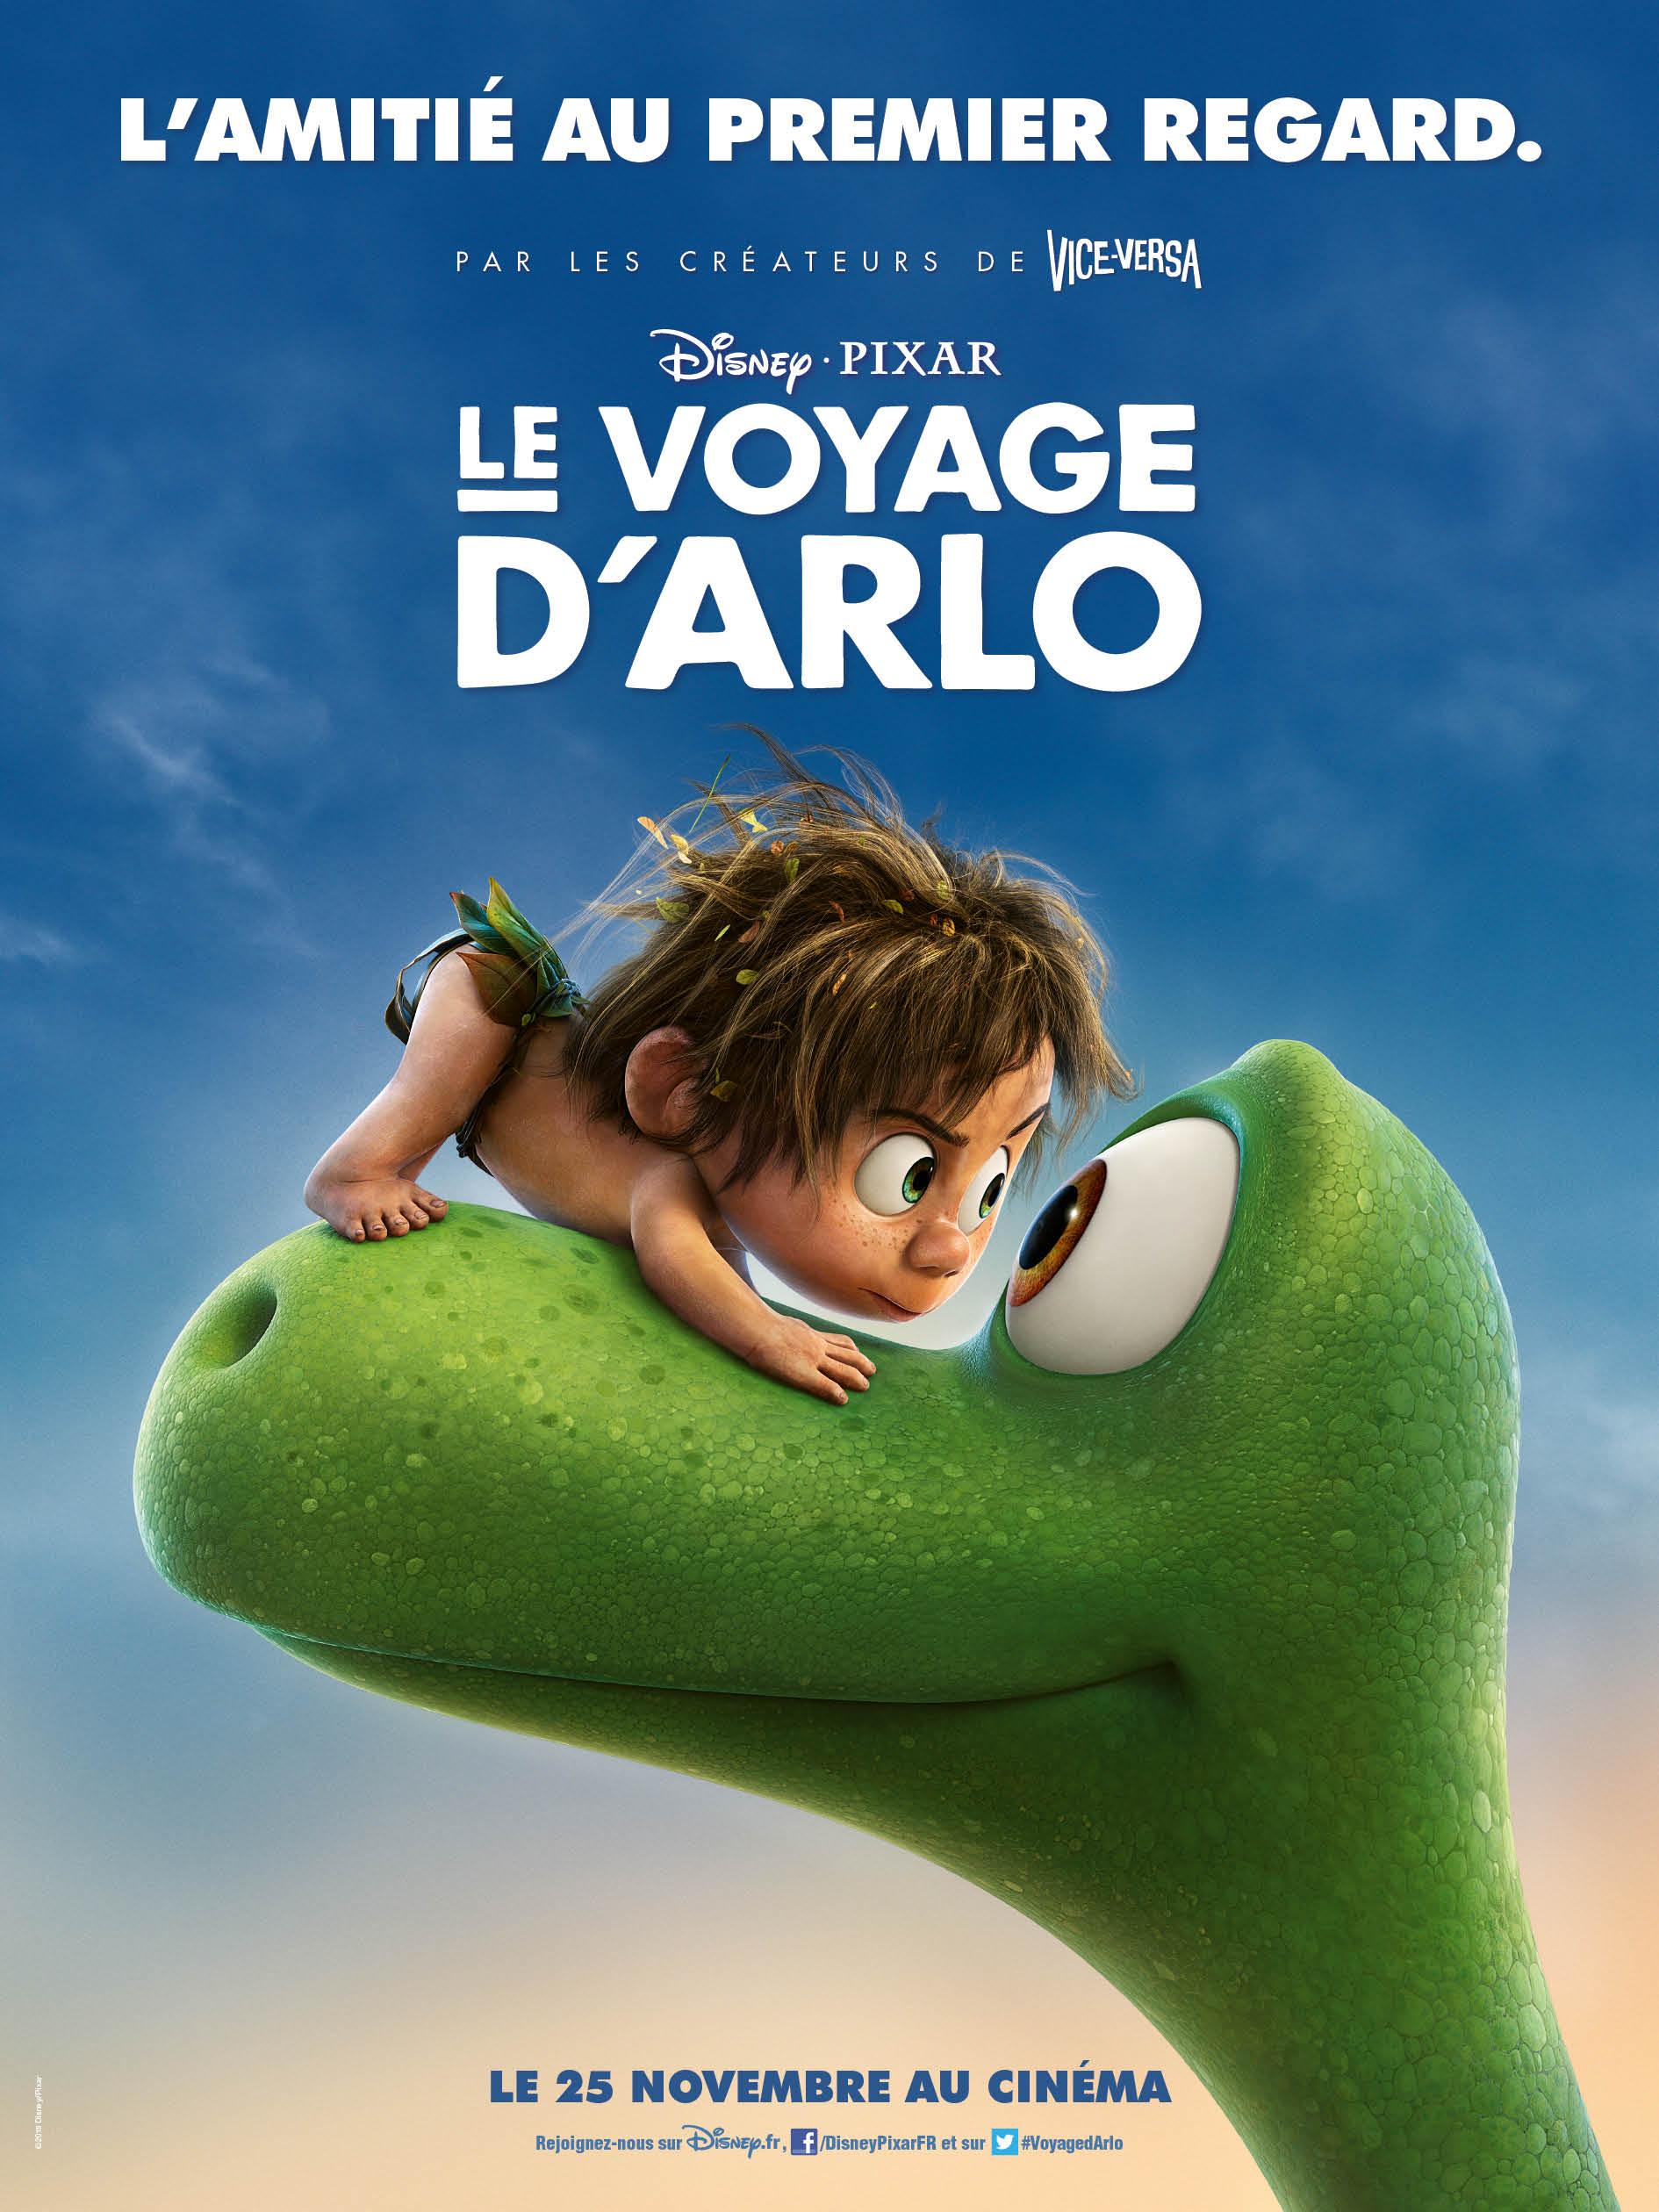 pixar disney affiche poster voyage arlo good dinosaur